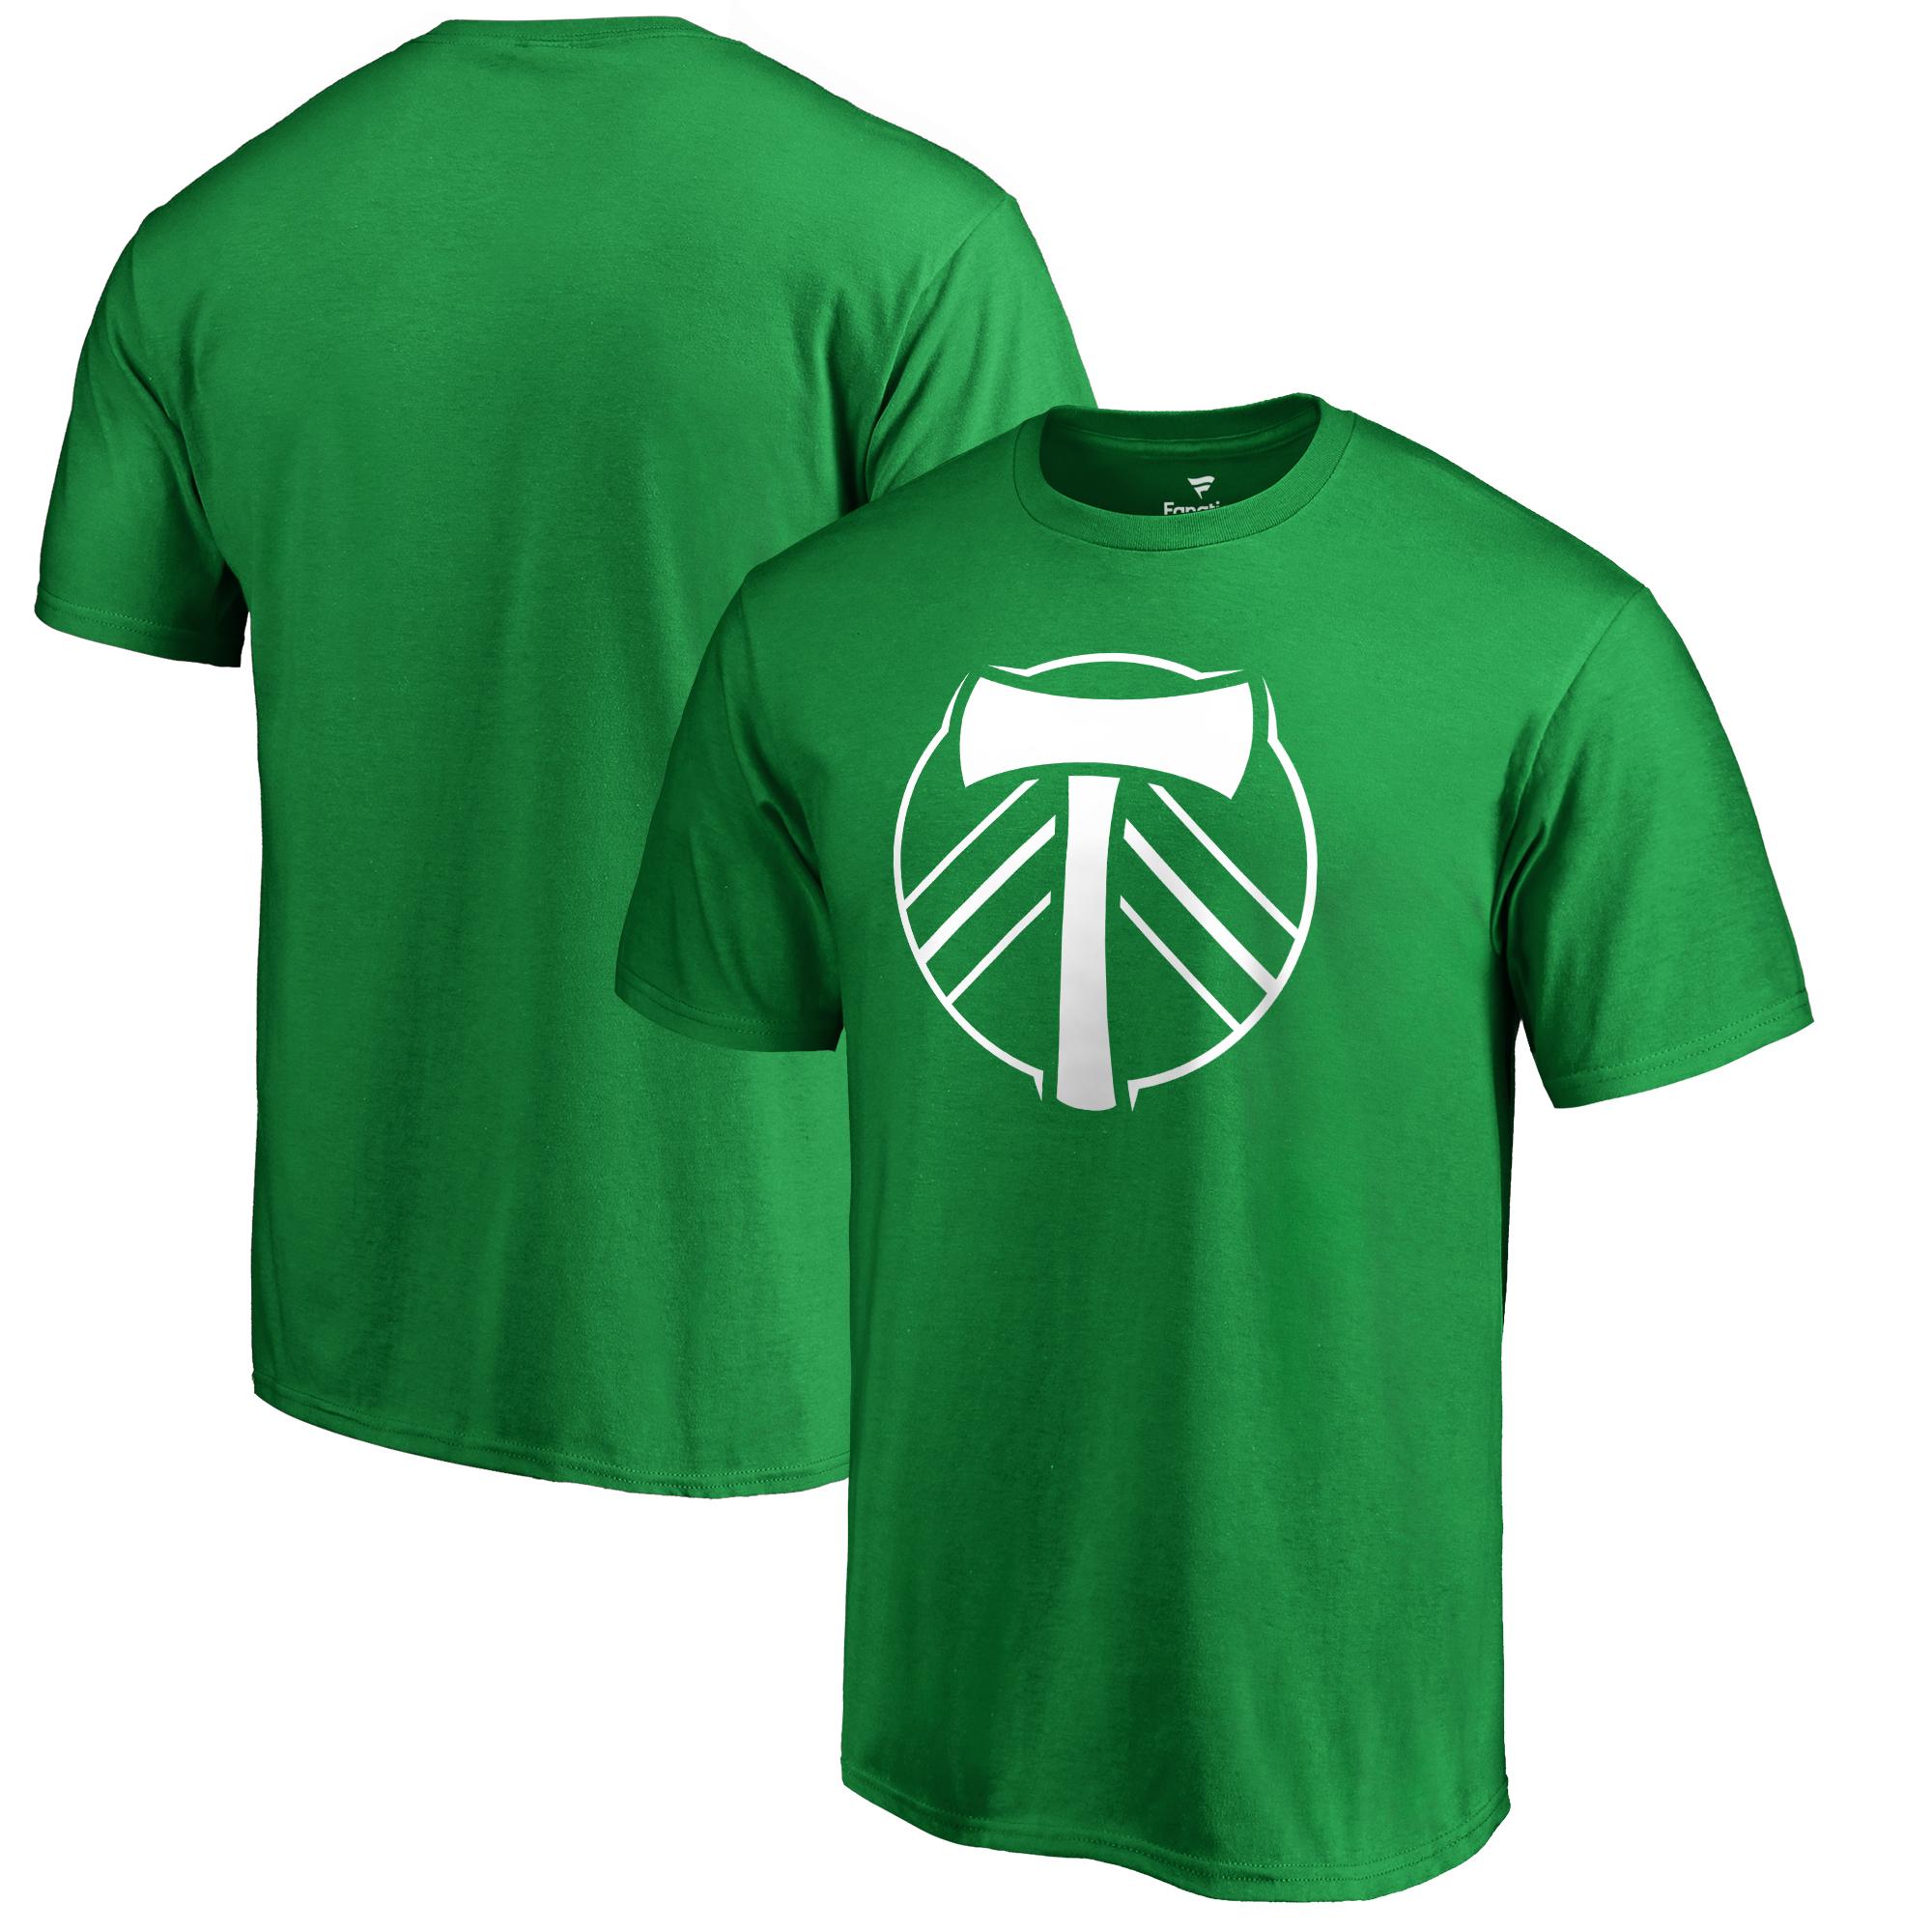 Portland Timbers Fanatics Branded St. Patrick's Day White Logo T-Shirt - Kelly Green